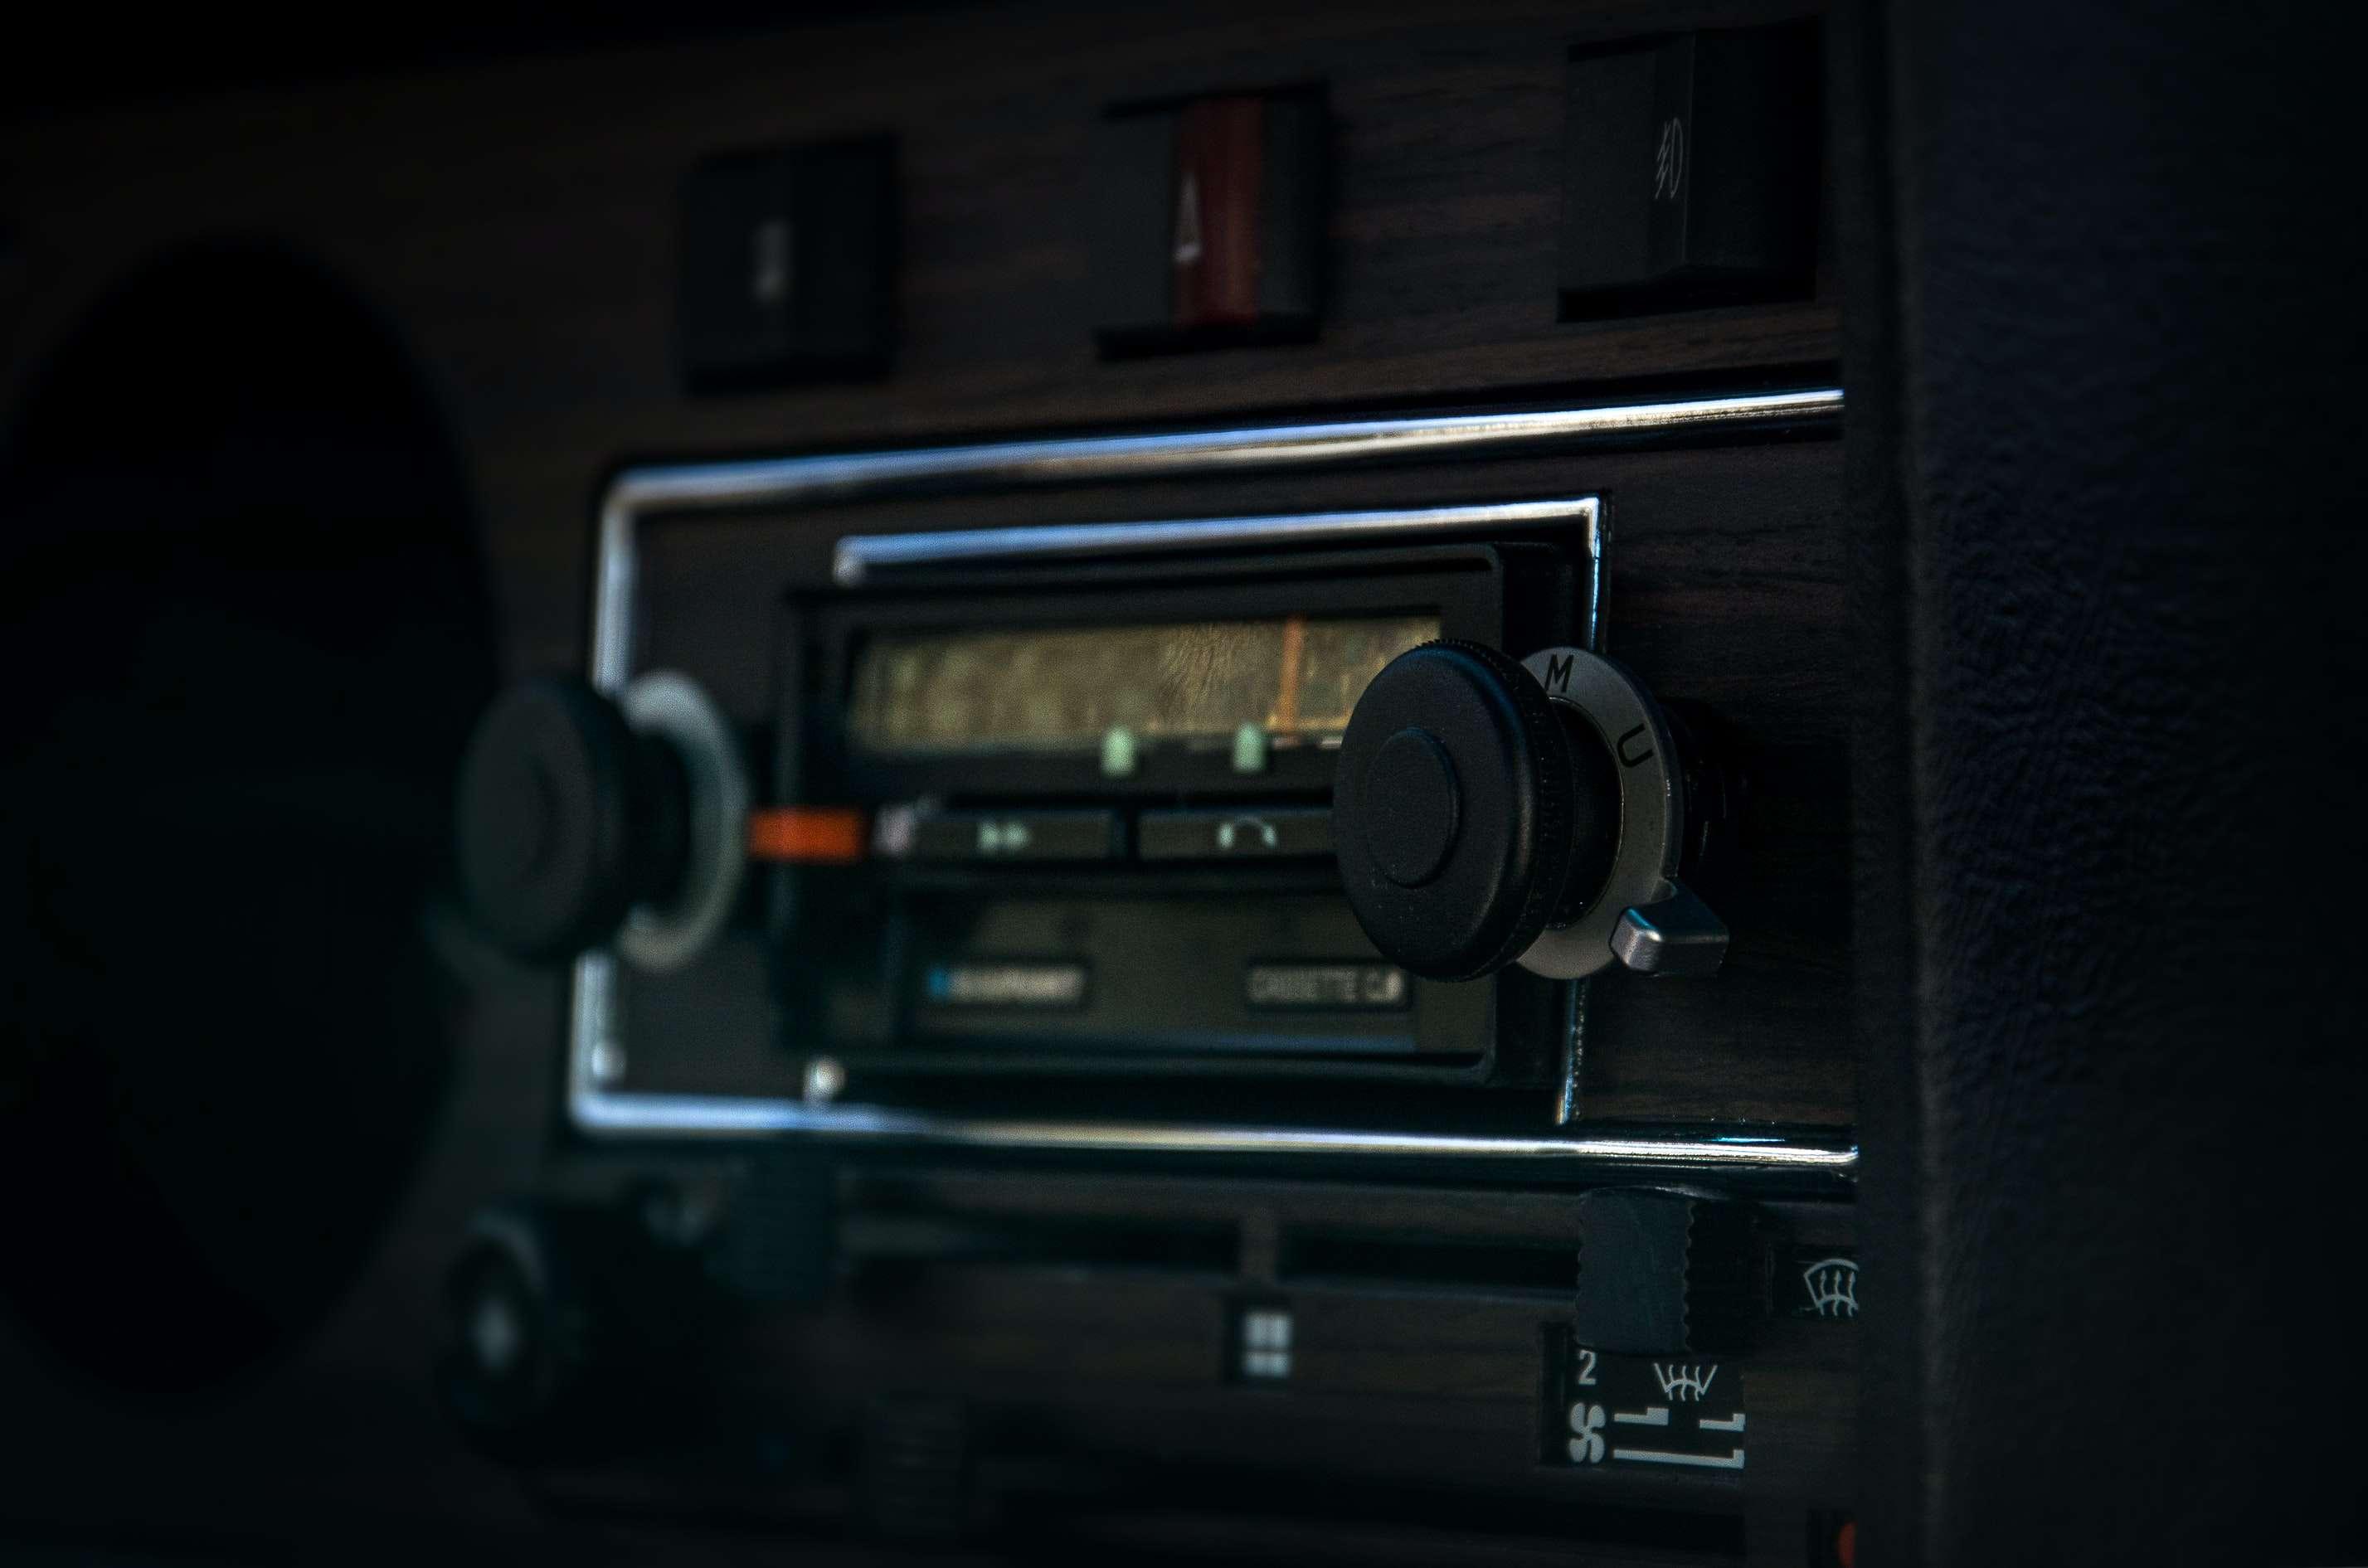 black 1-din car radio unit